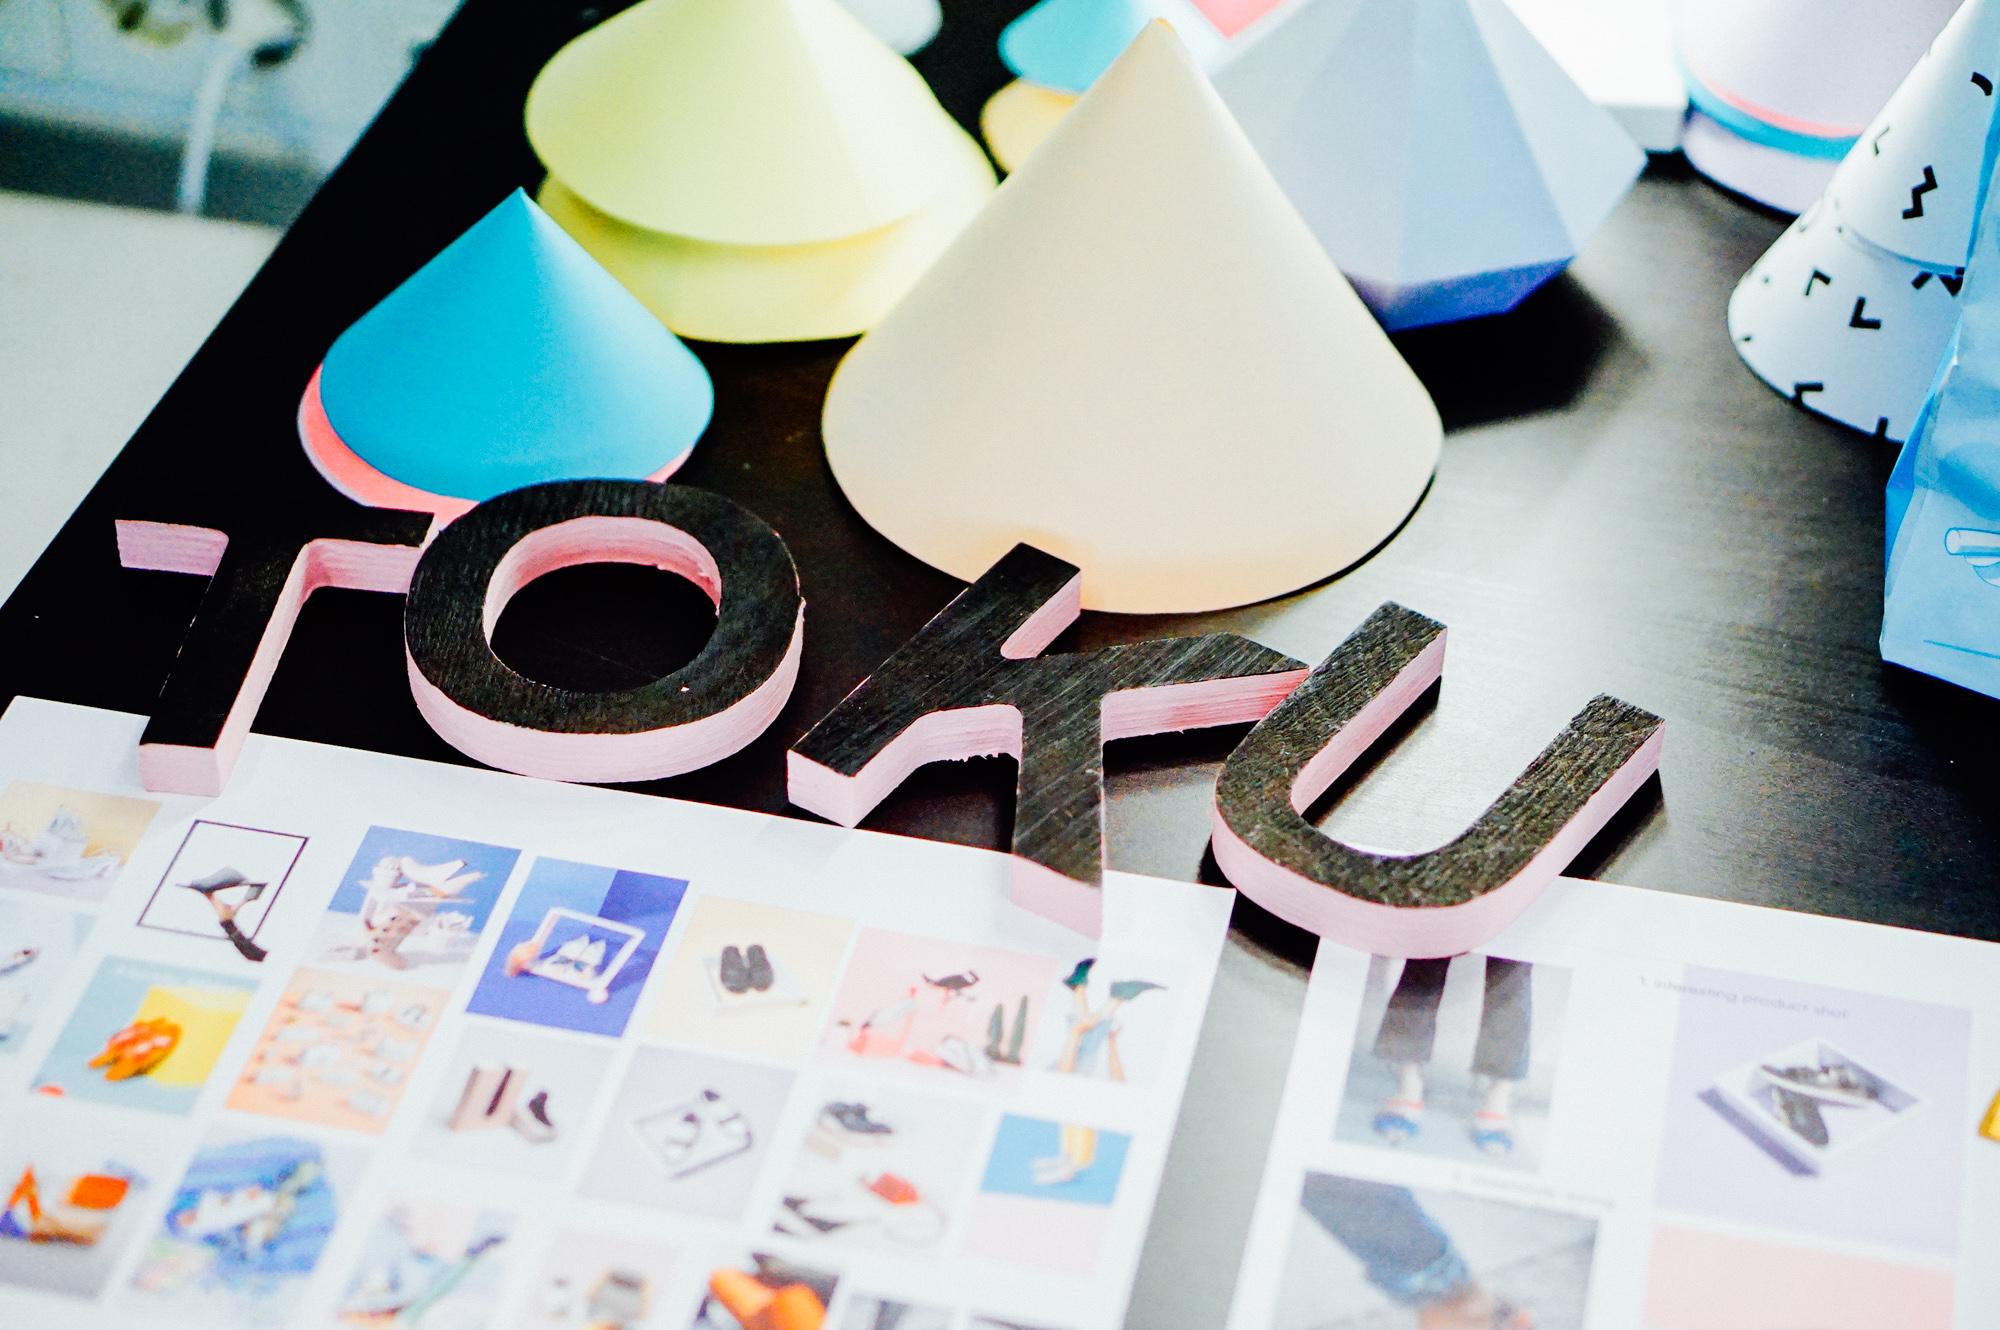 TOKU branding, graphic design